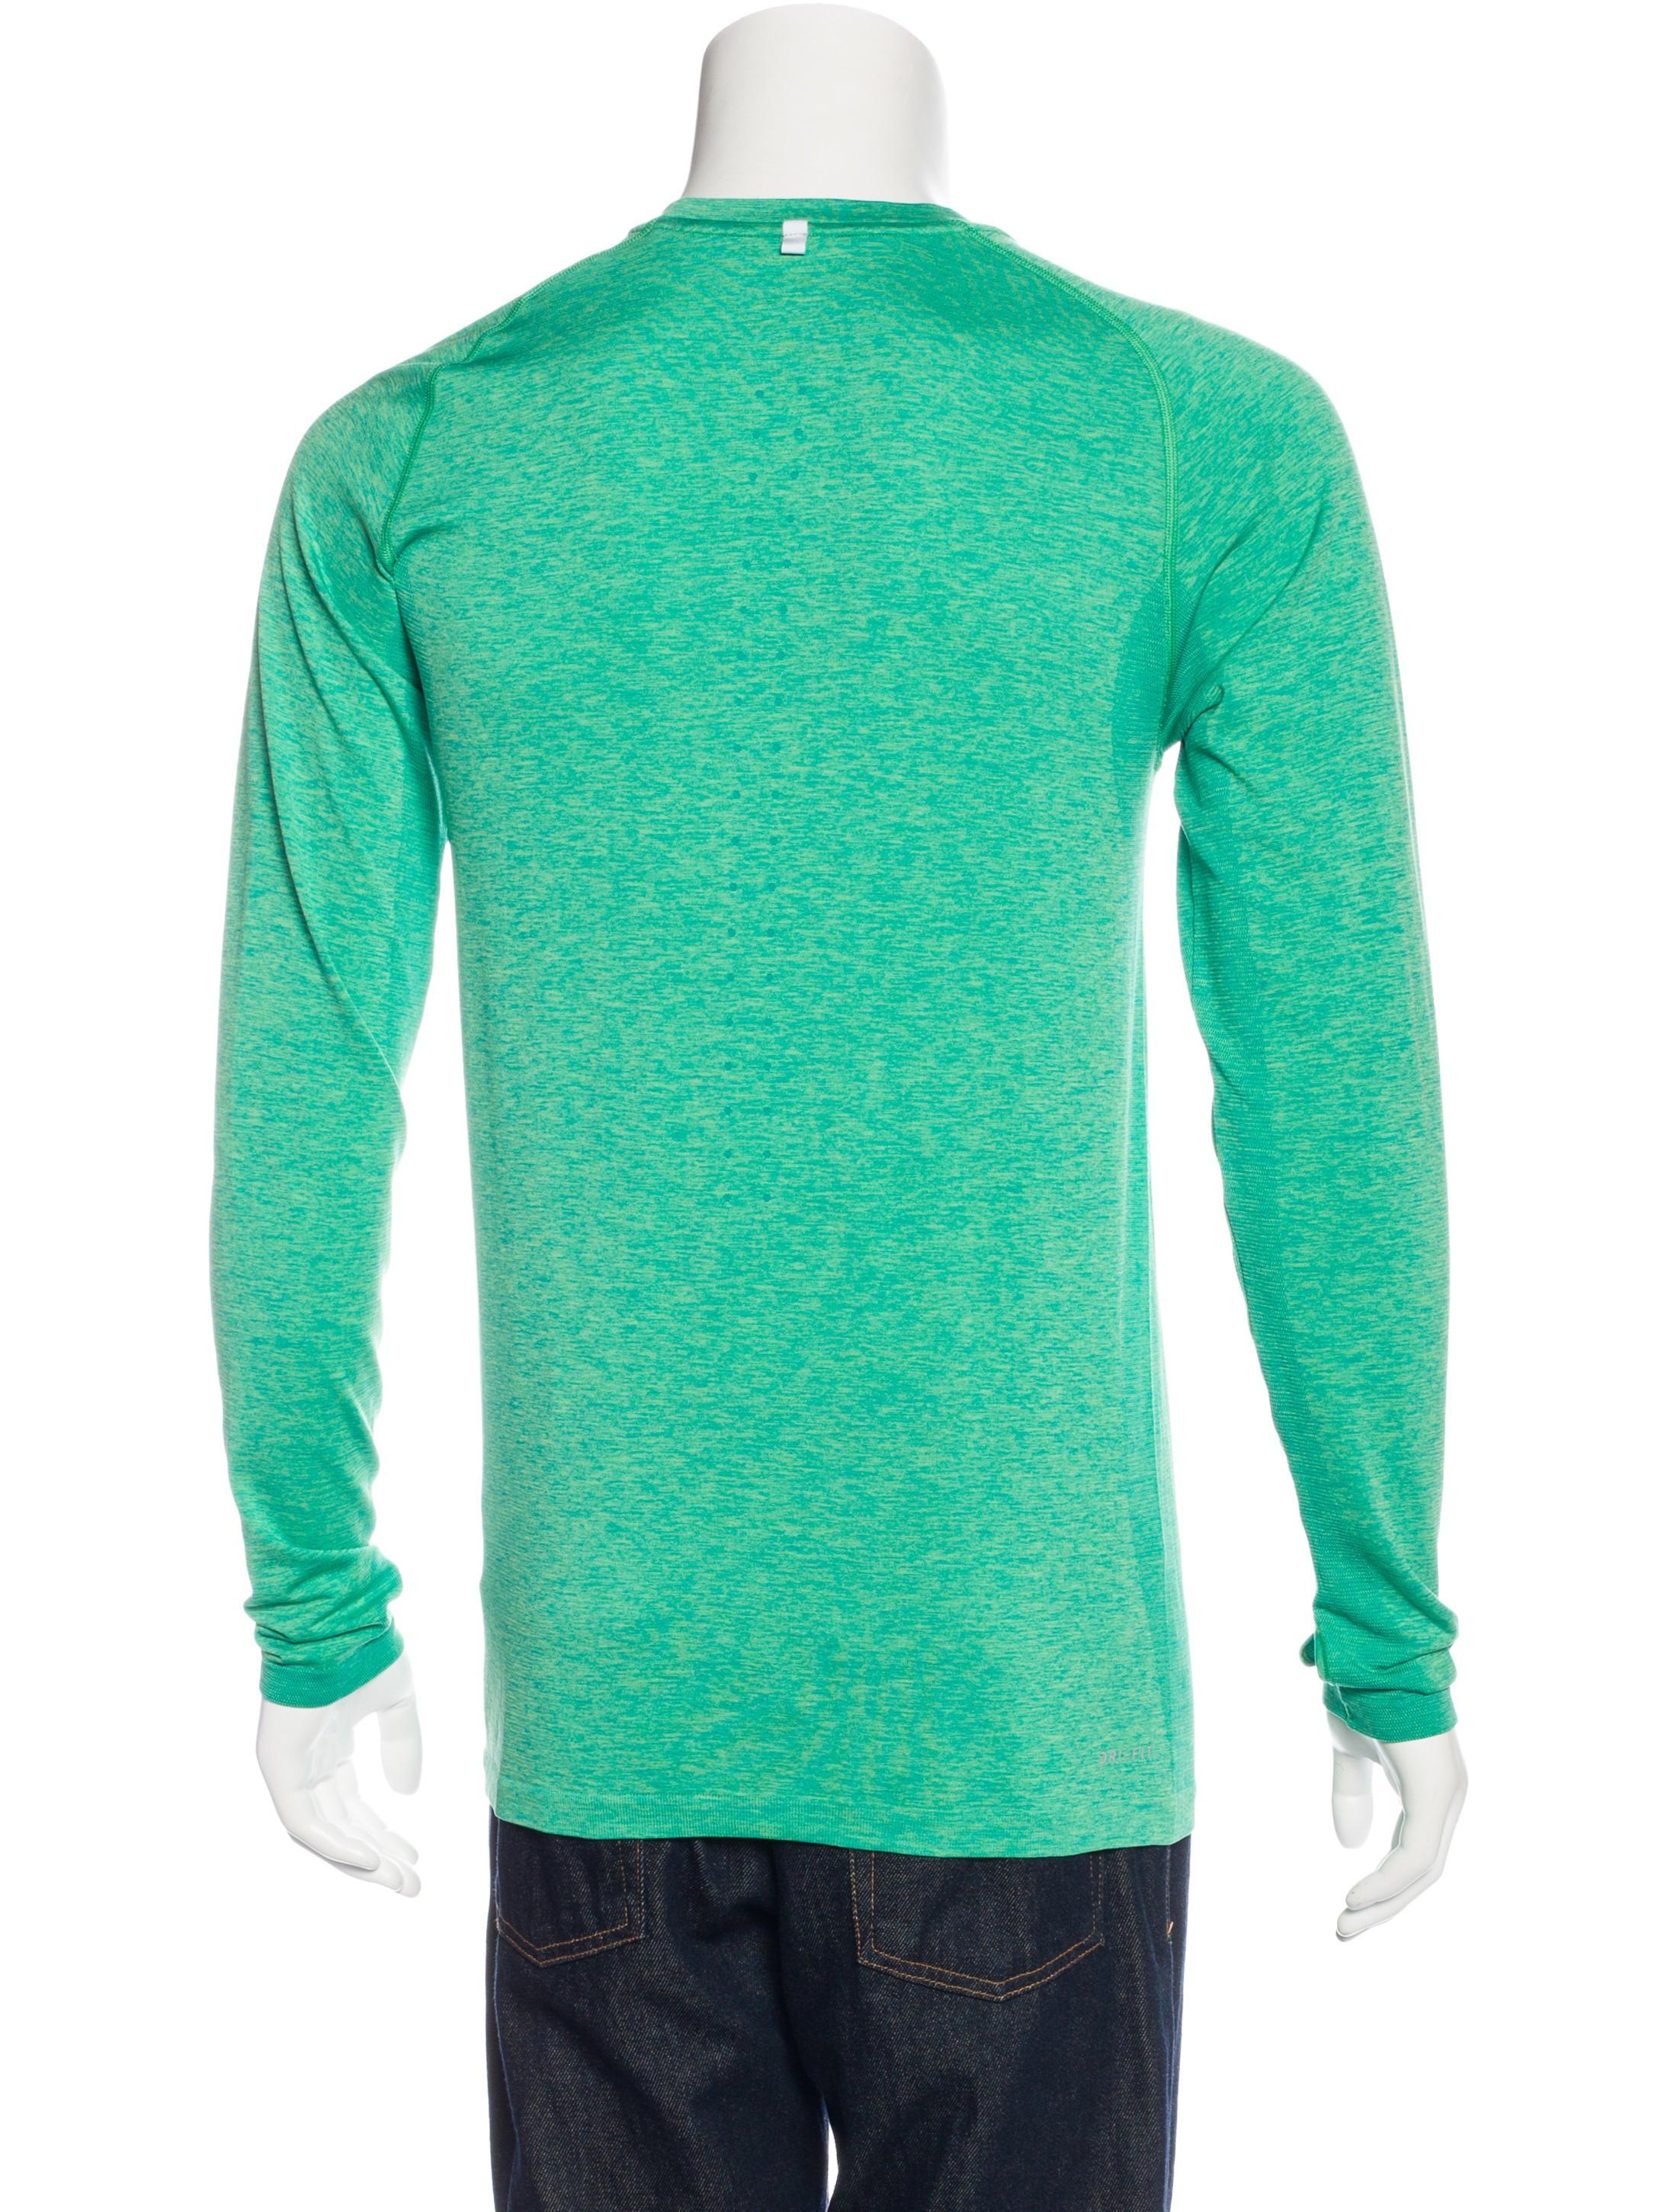 Nike Dri Fit Running T Shirt Clothing Wu221118 The